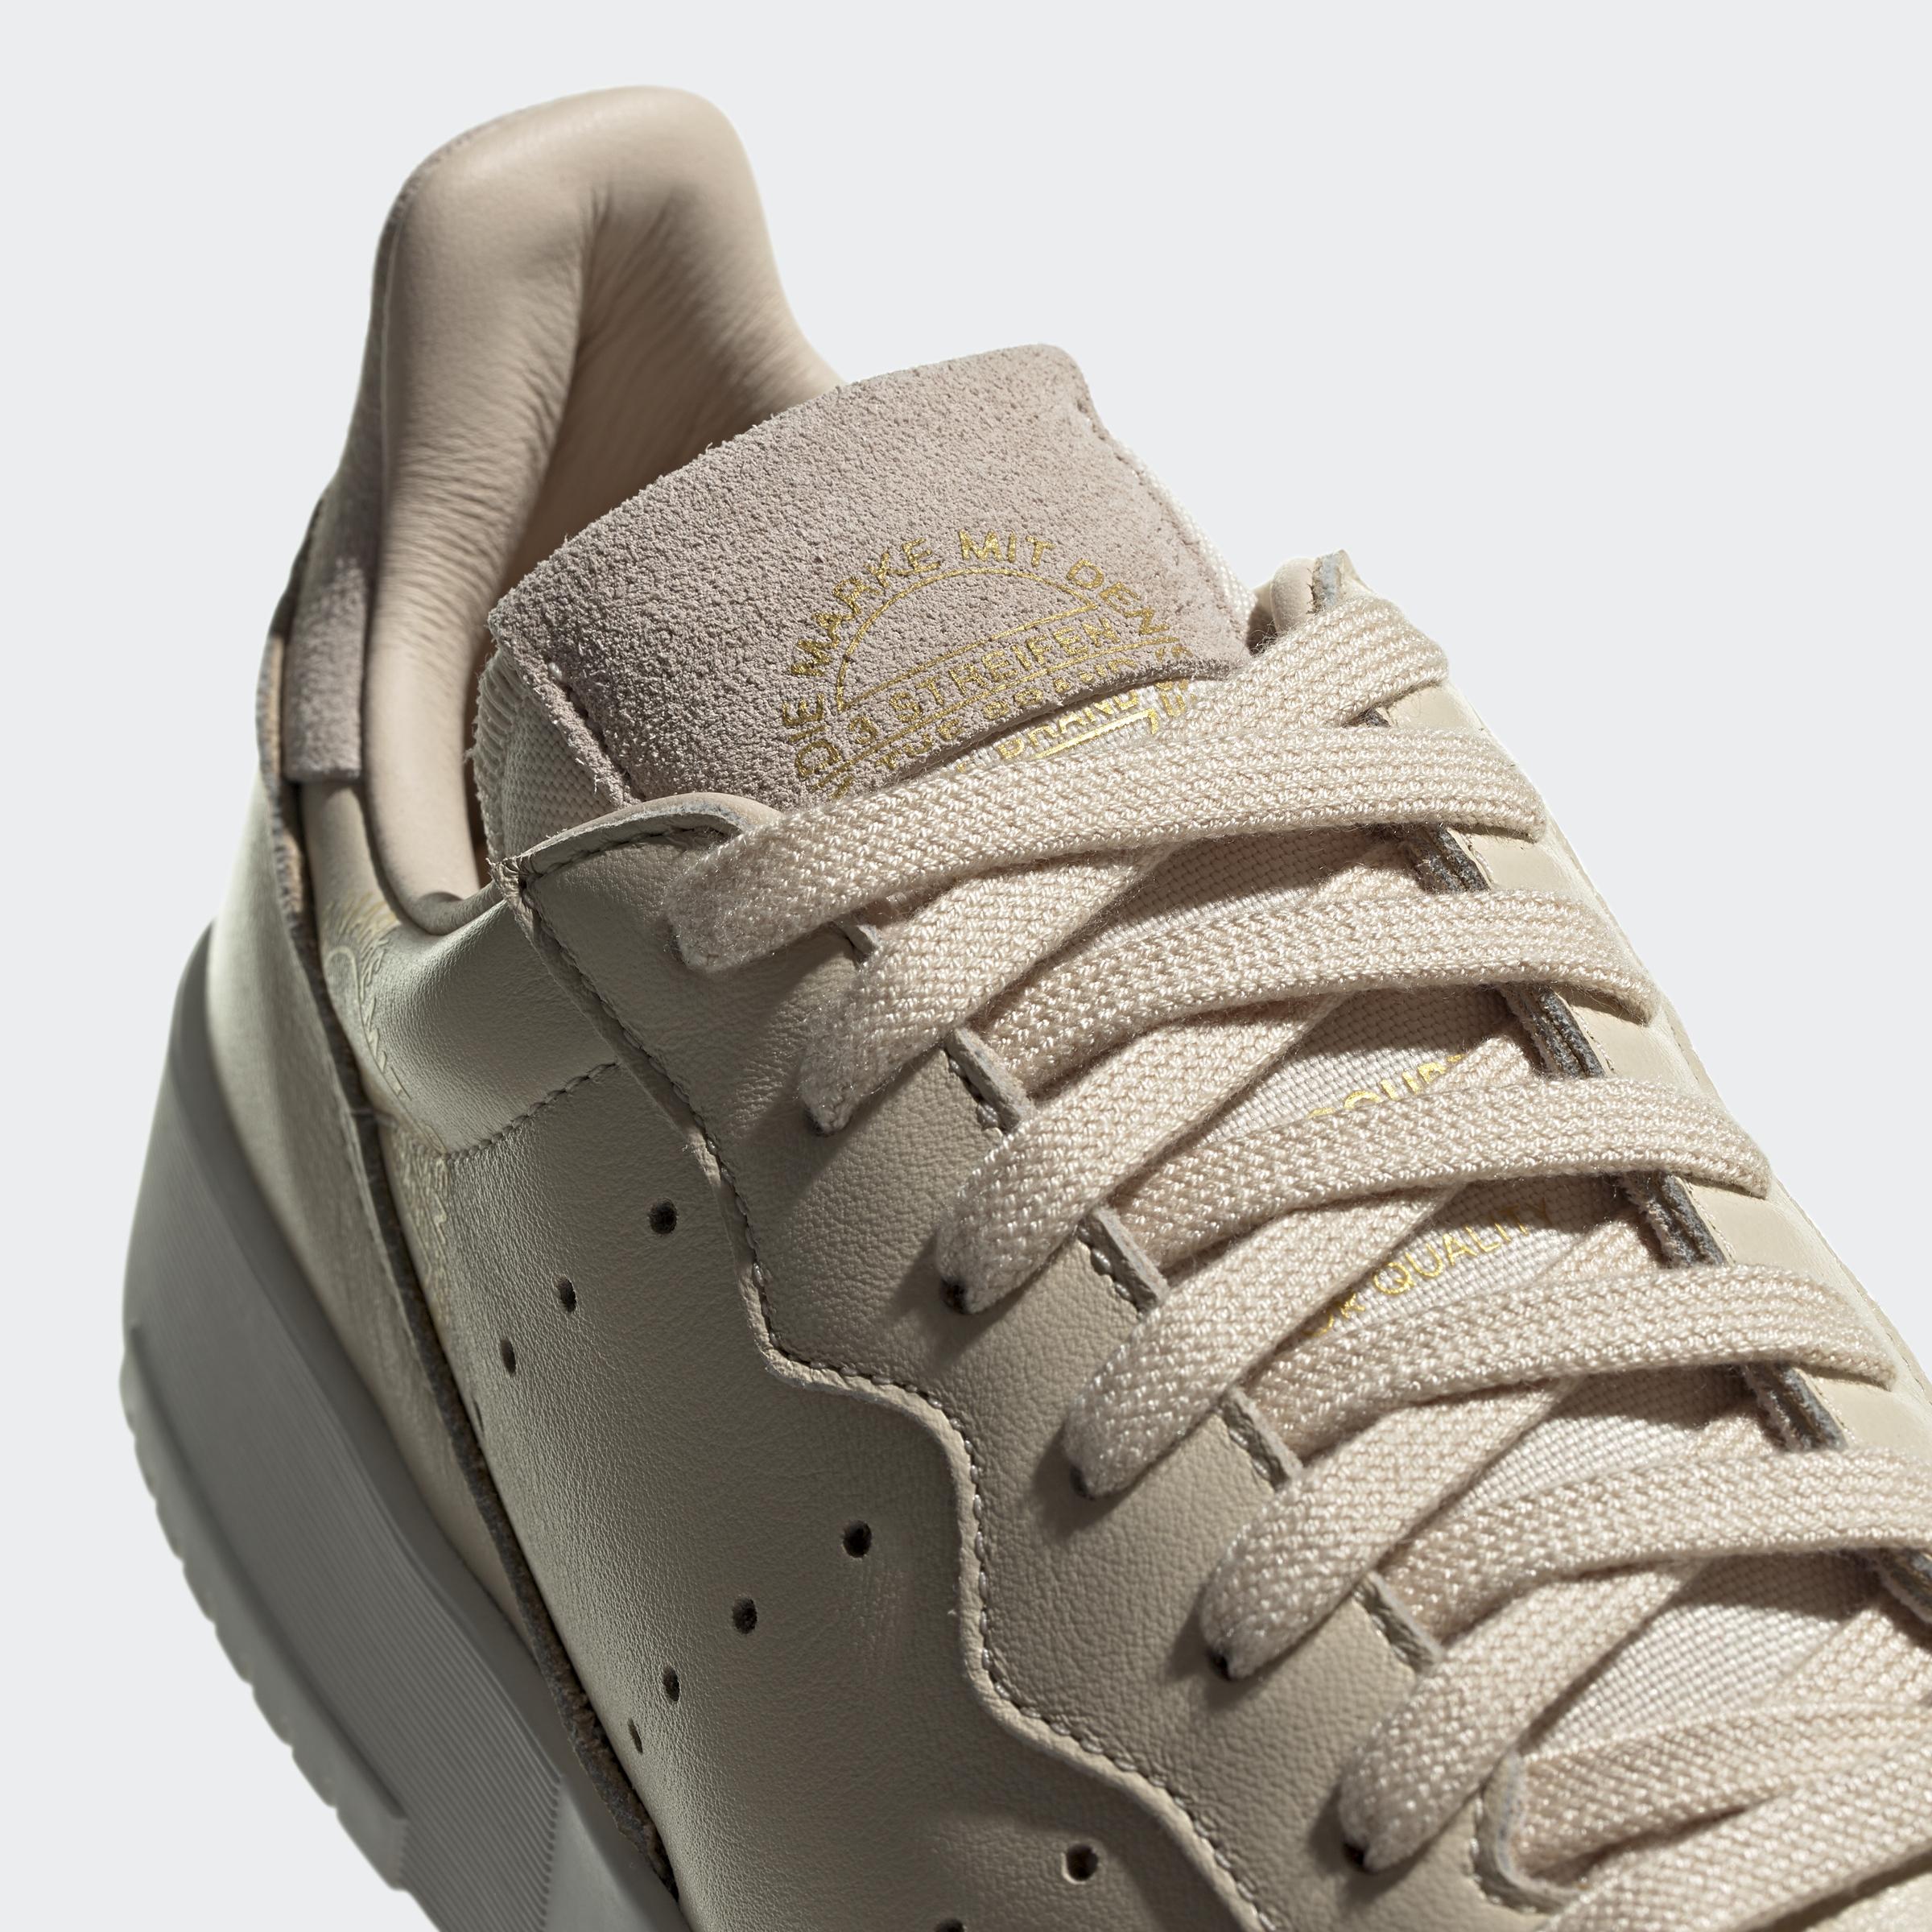 Indexbild 9 - adidas Originals Supercourt Schuh Herren, Damen Sneakers Turnschuhe  Freizeit